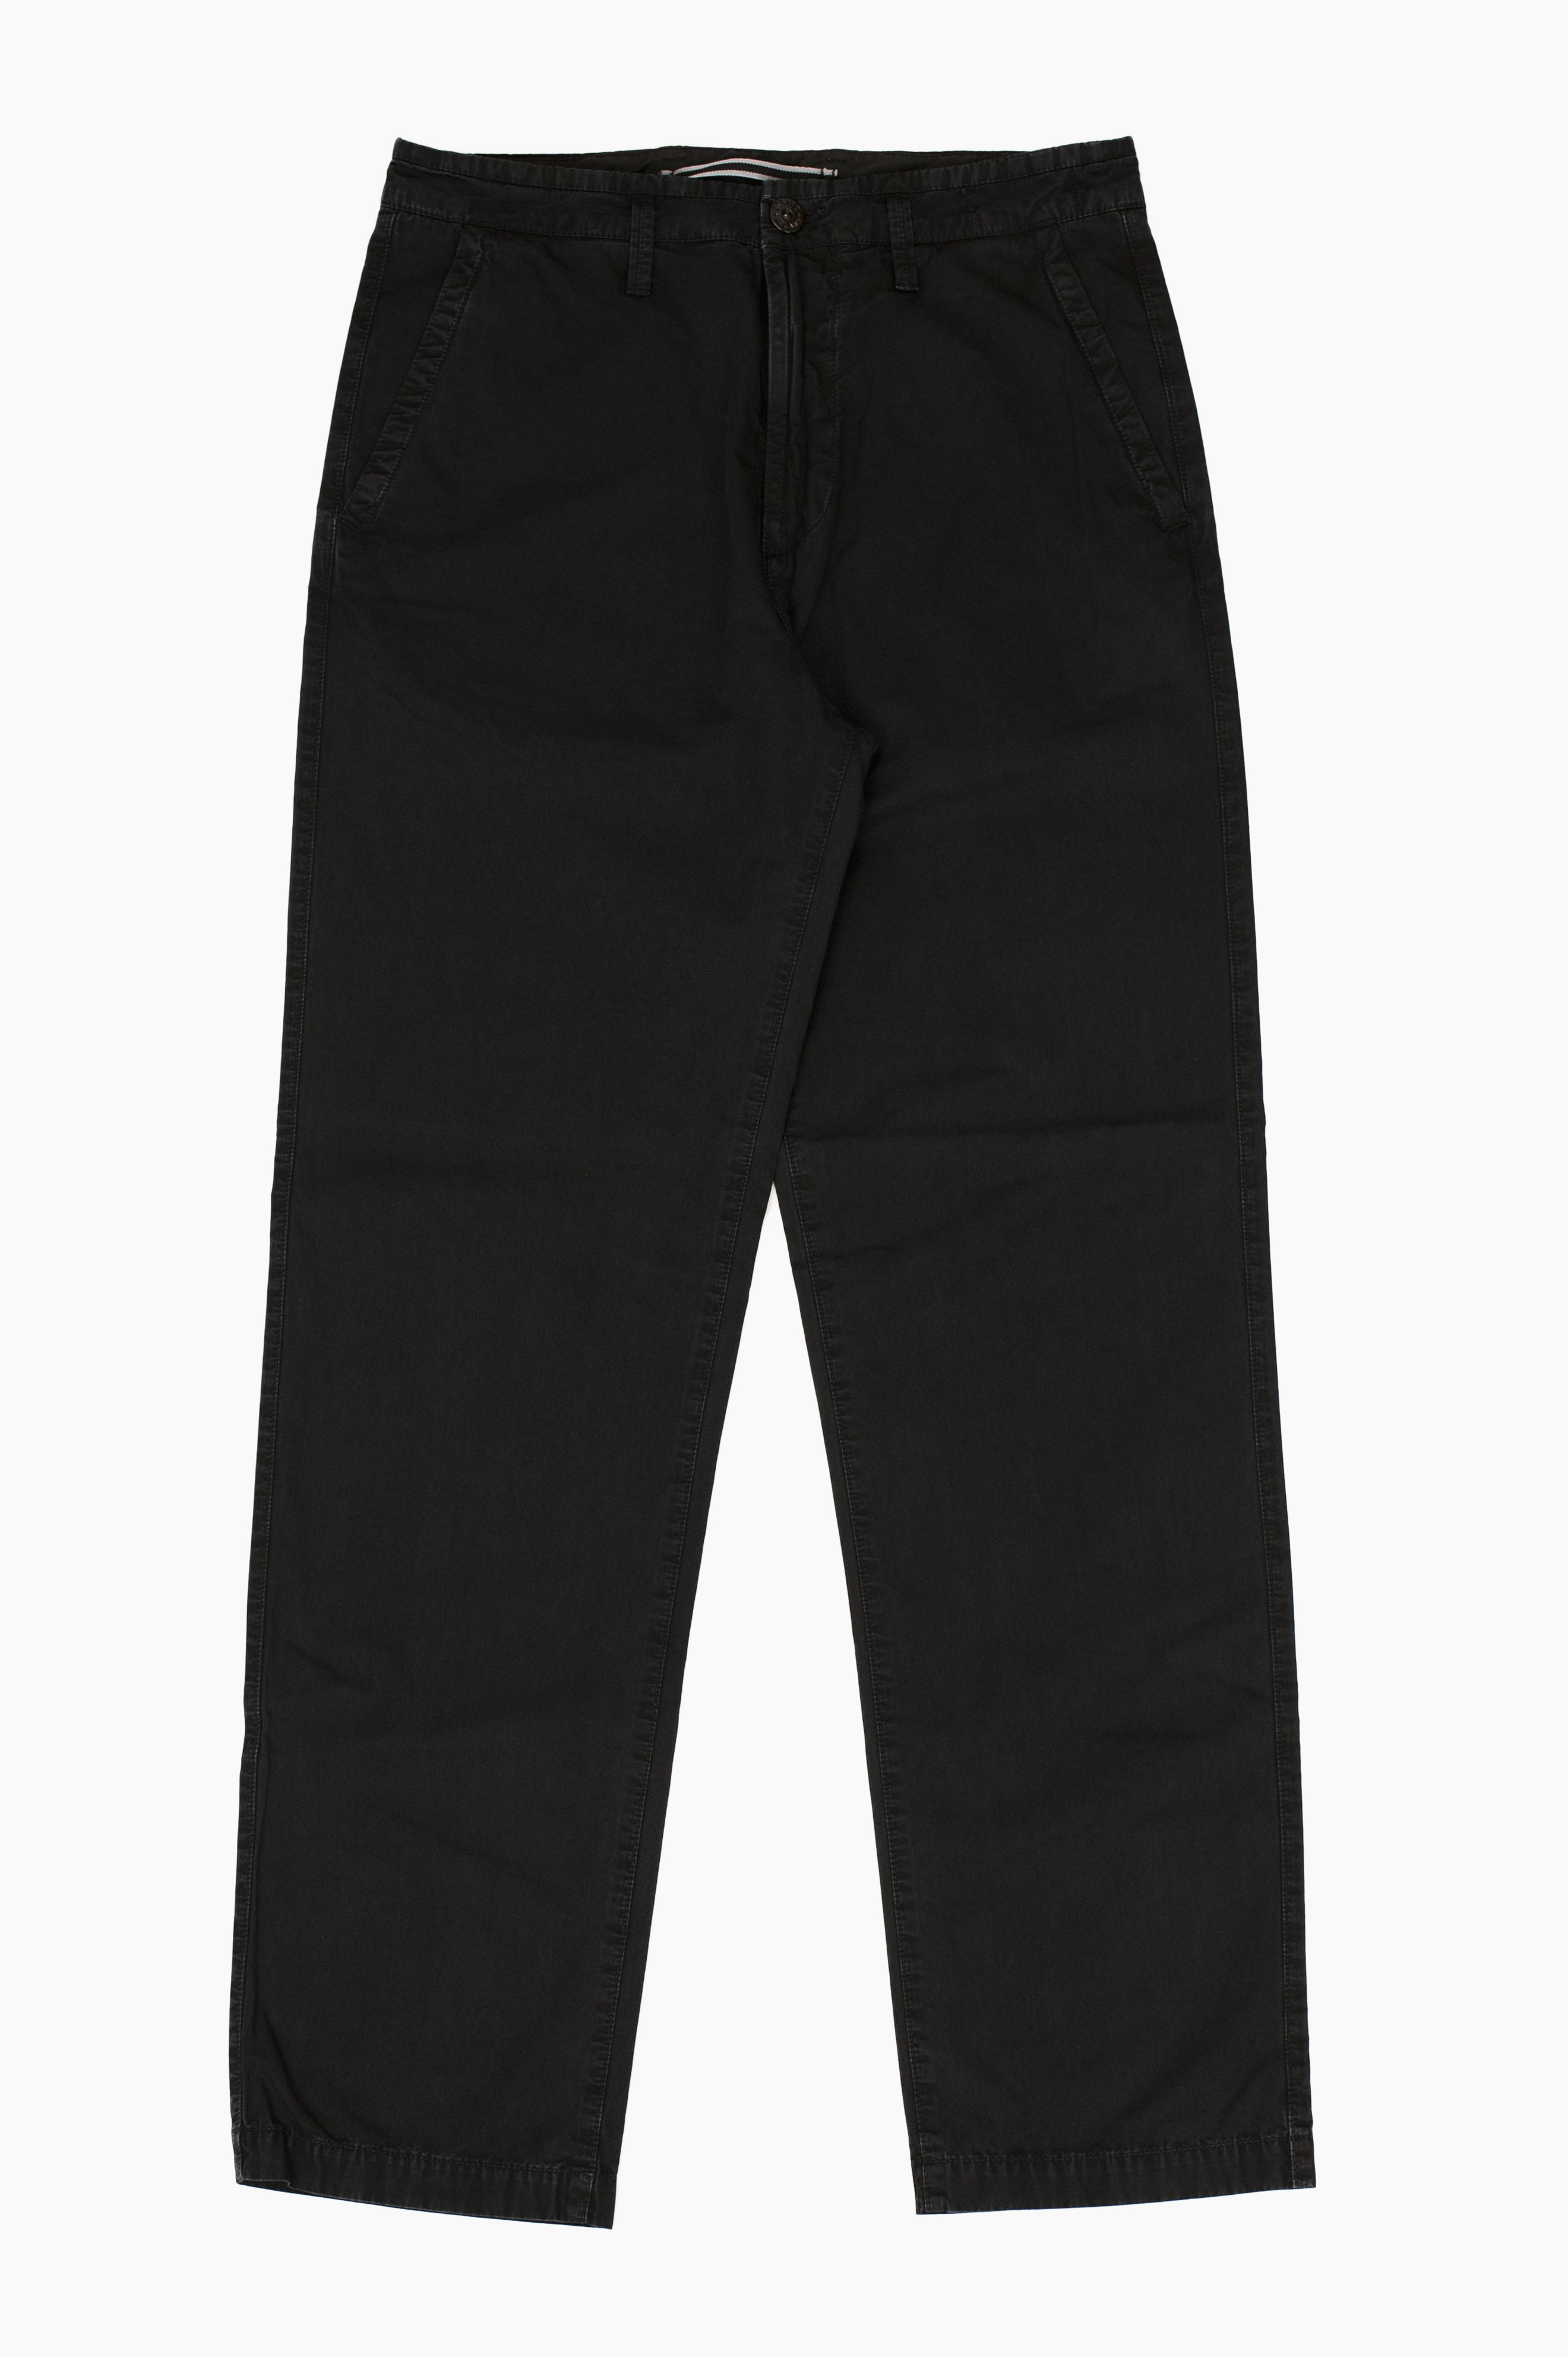 Chino Pants Black